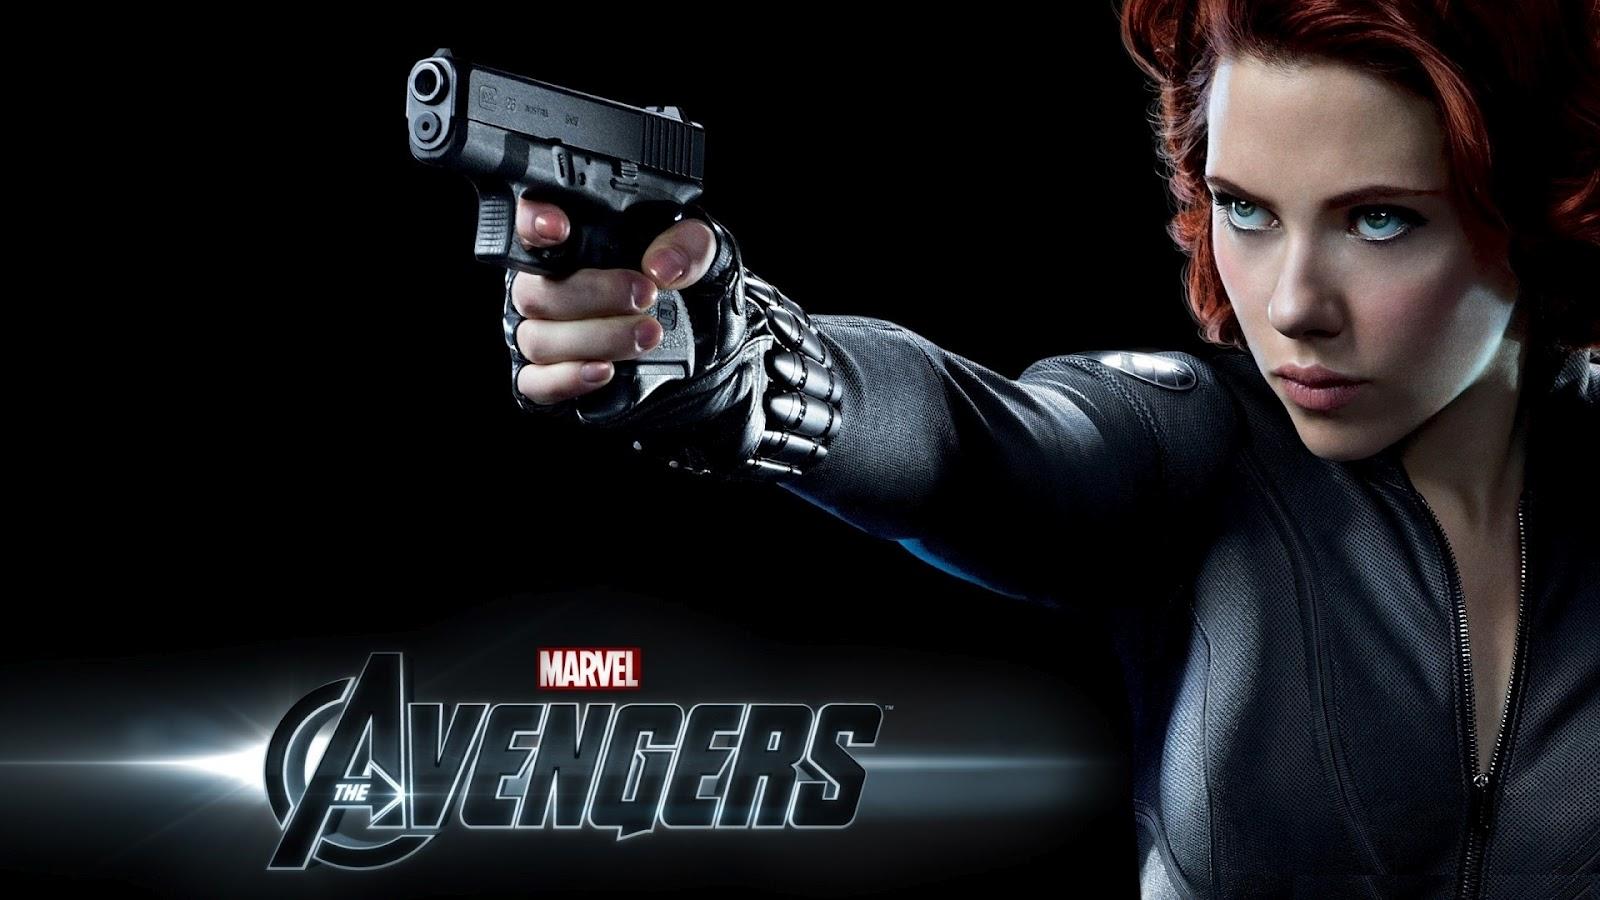 http://4.bp.blogspot.com/-_961J6K3cXU/T29fZkhLejI/AAAAAAAABAE/r_nMg0V-OFo/s1600/The_Avengers_Black_Widow_Scarlett_Johansson_HD_Wallpaper-Vvallpaper.Net.jpg